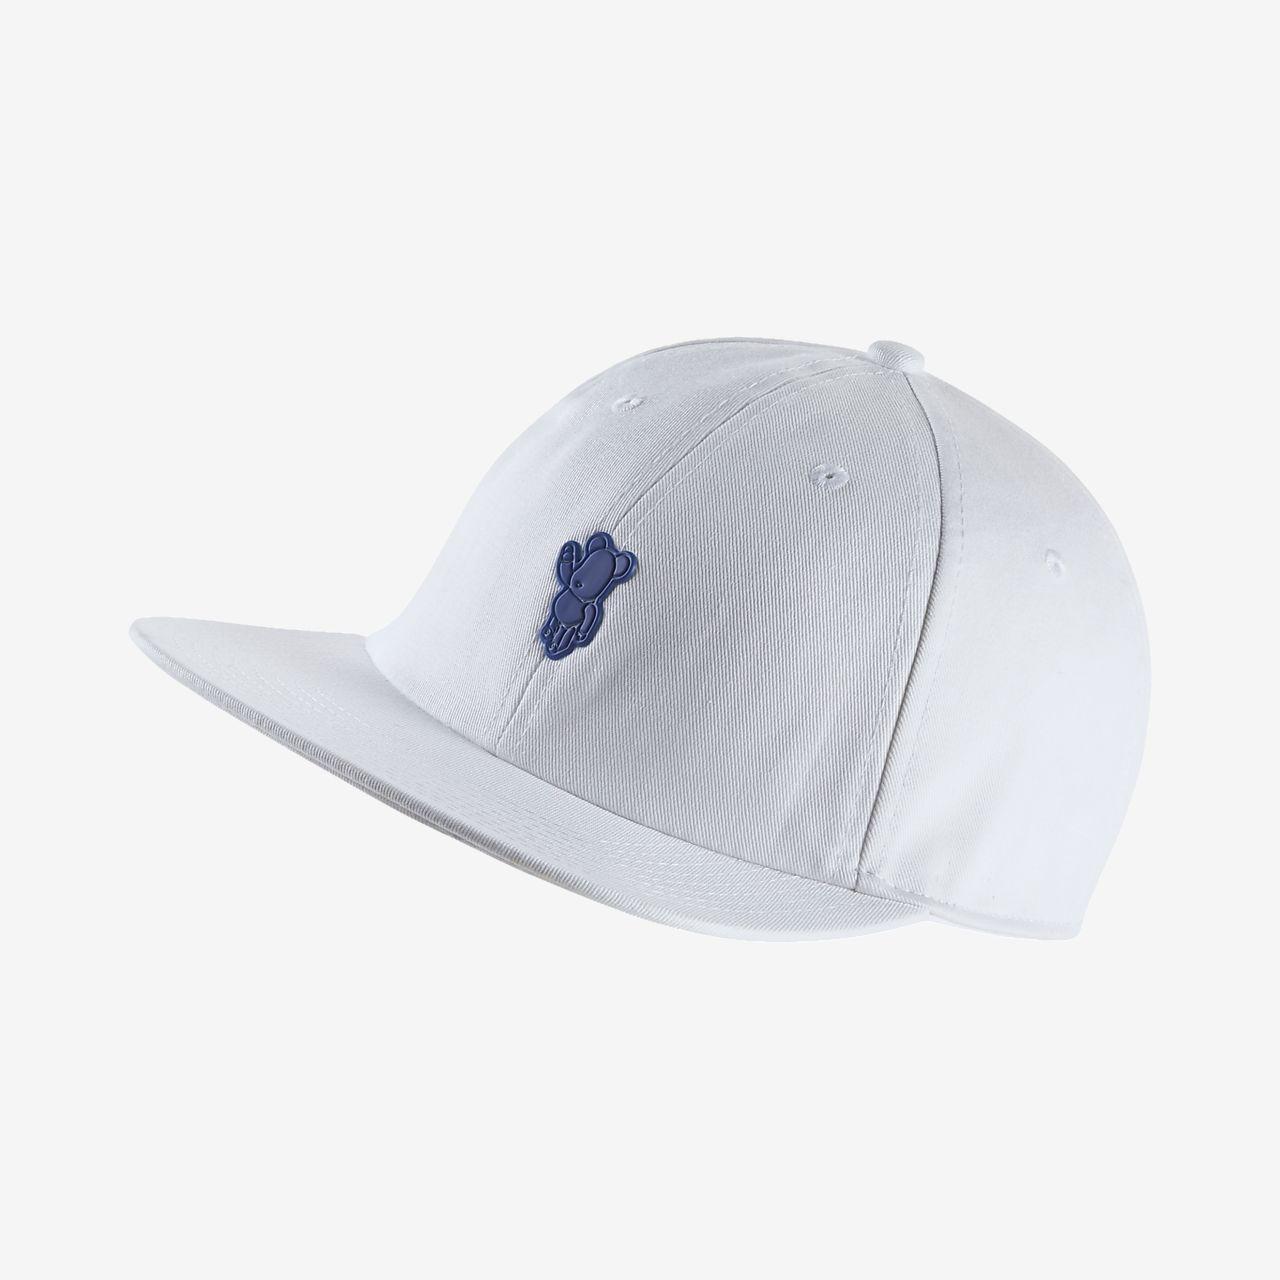 f148f0a2f28 Nike SB x Medicom H86 Adjustable Hat. Nike.com IN